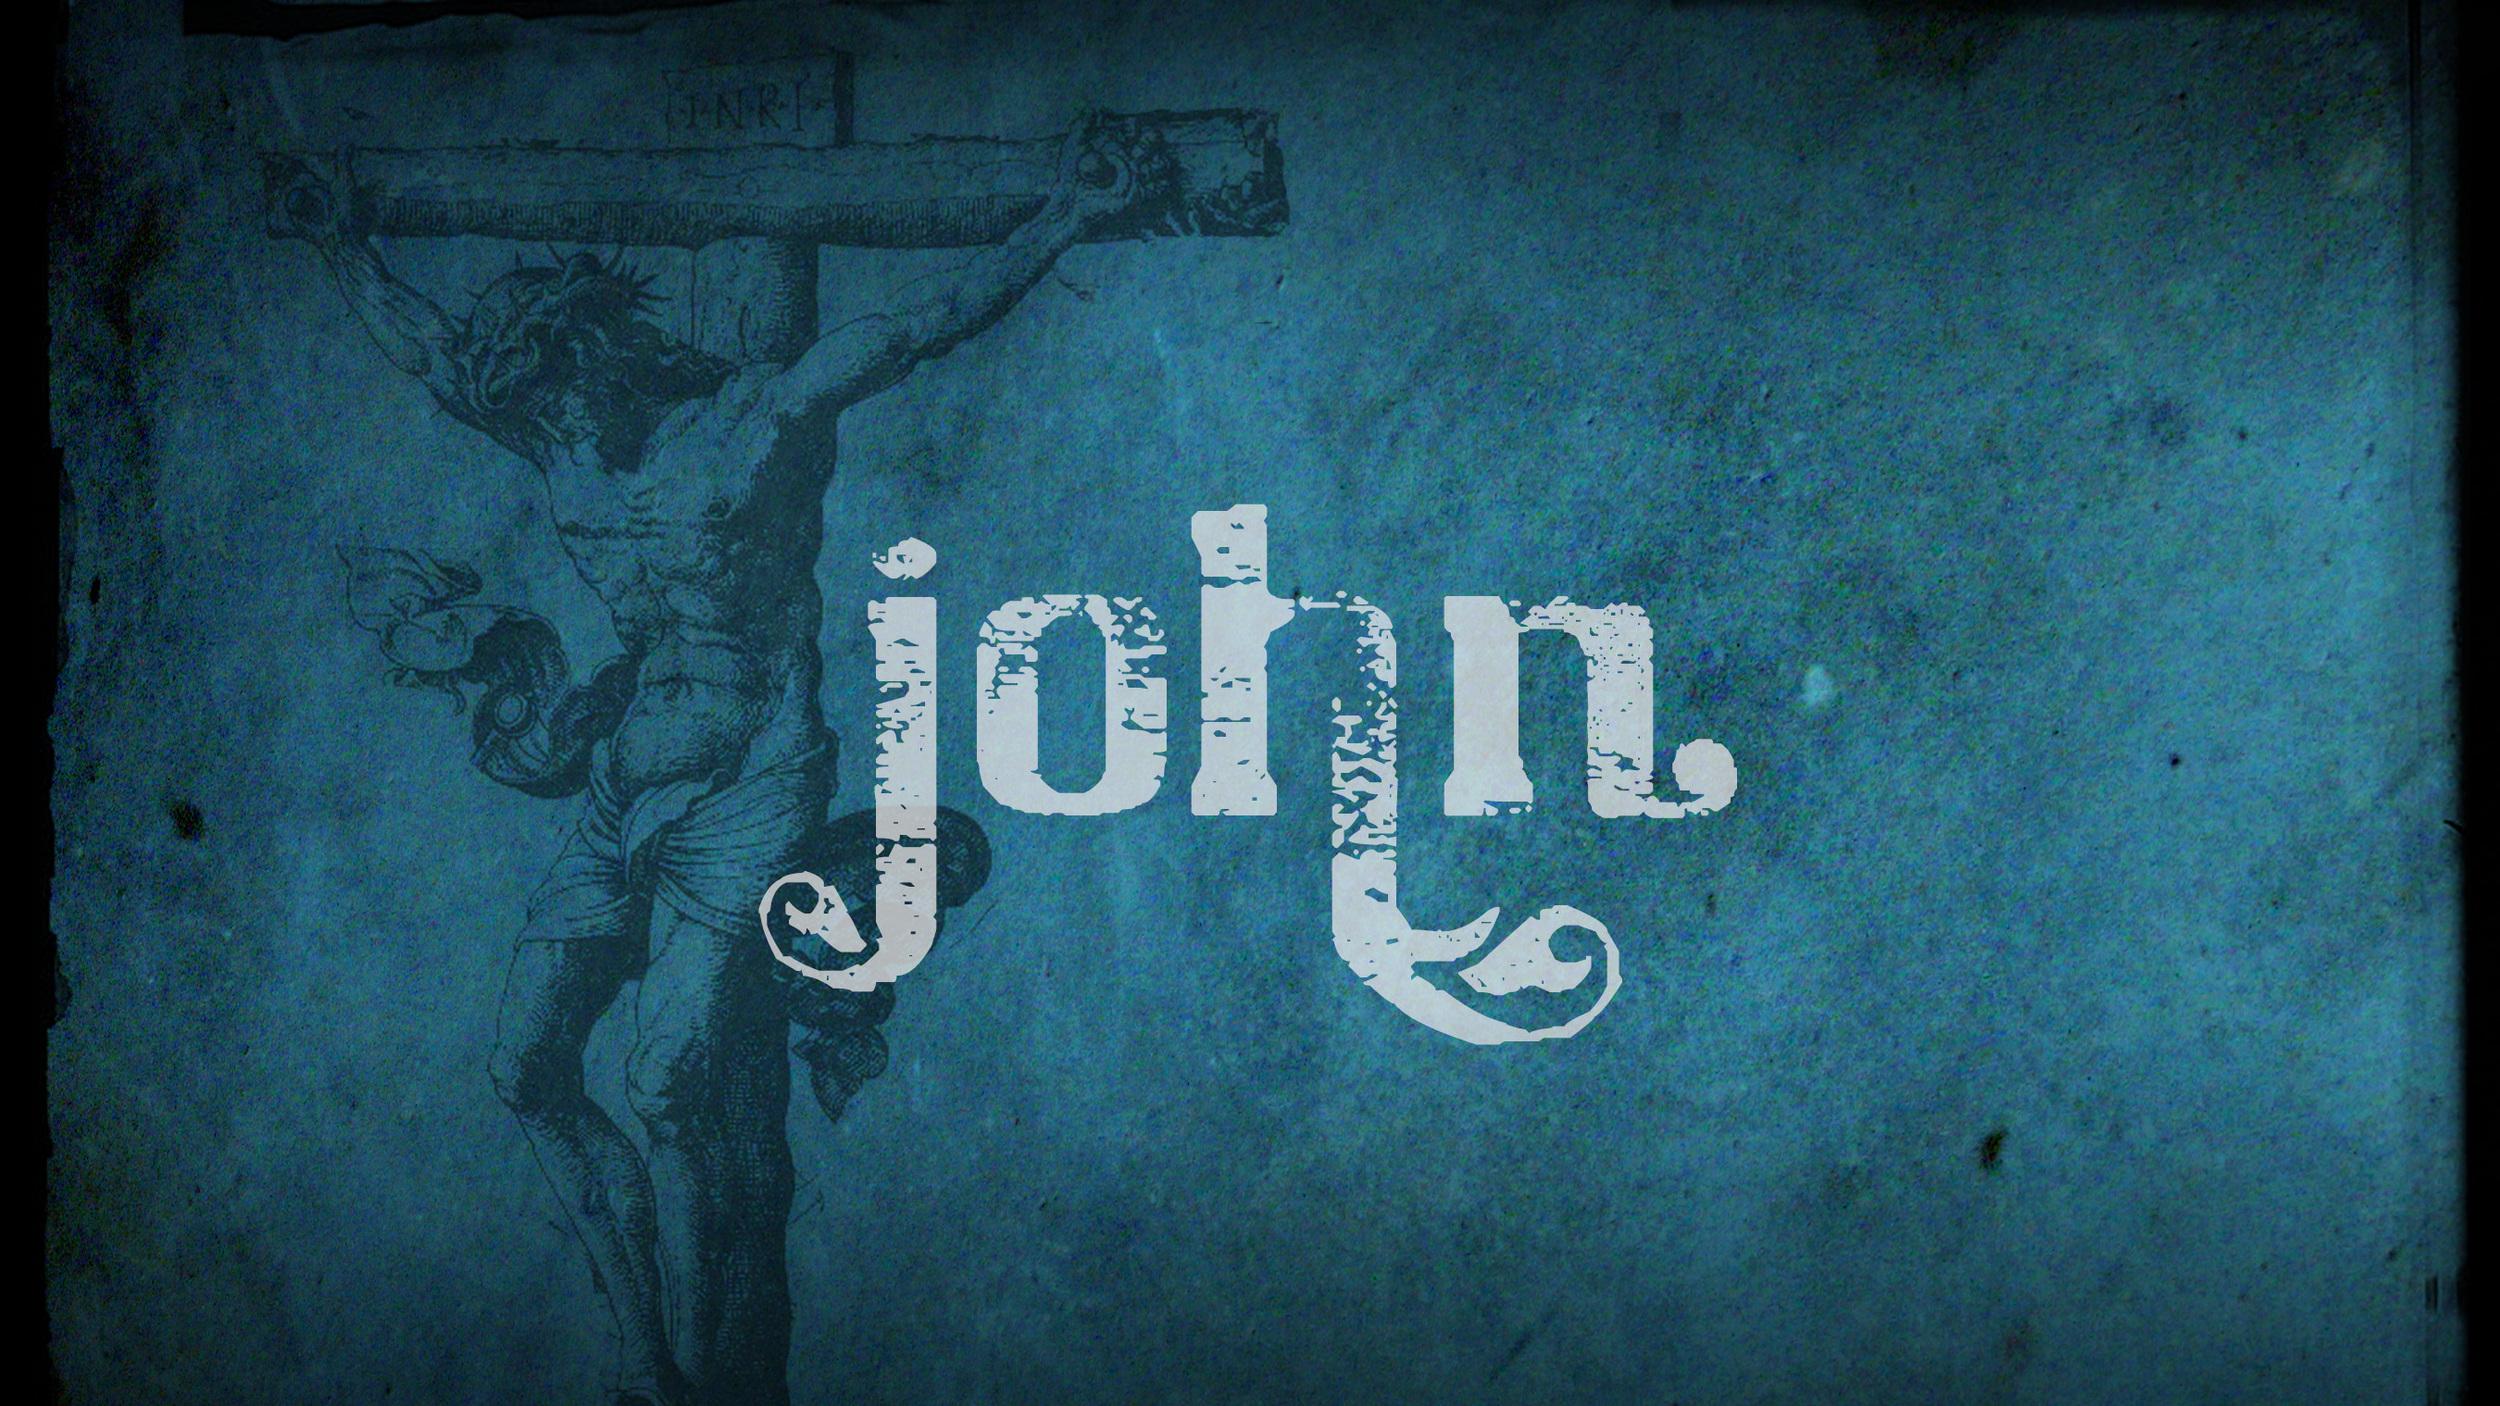 October 25, 2009 - August 28, 2011